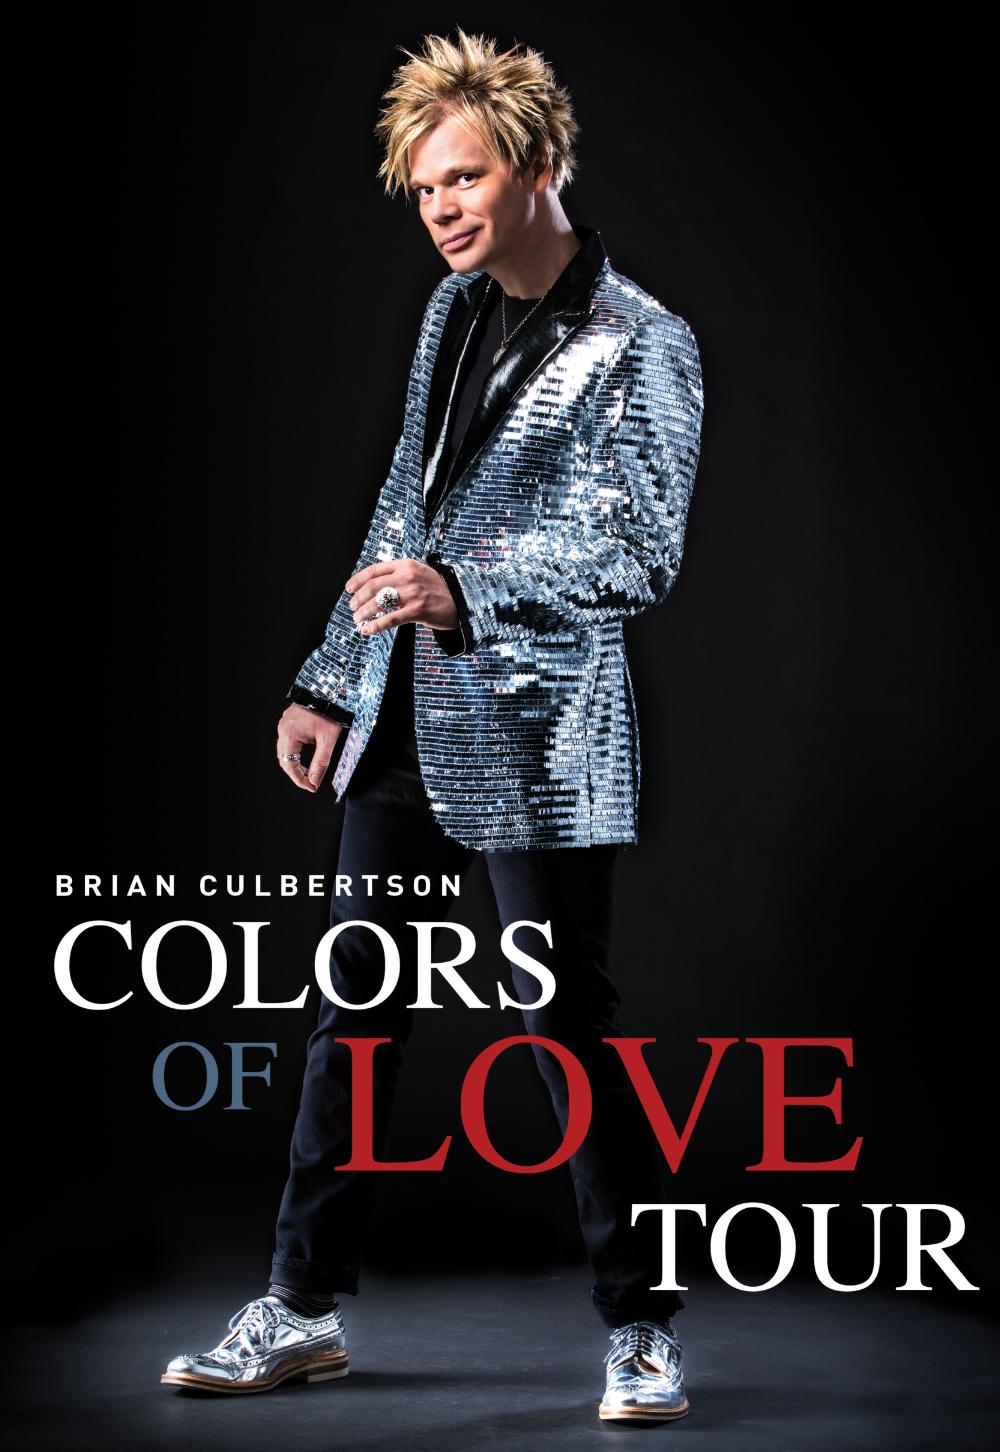 BrianCulbertson_ColorsOfLoveTour_ADMAT.jpg